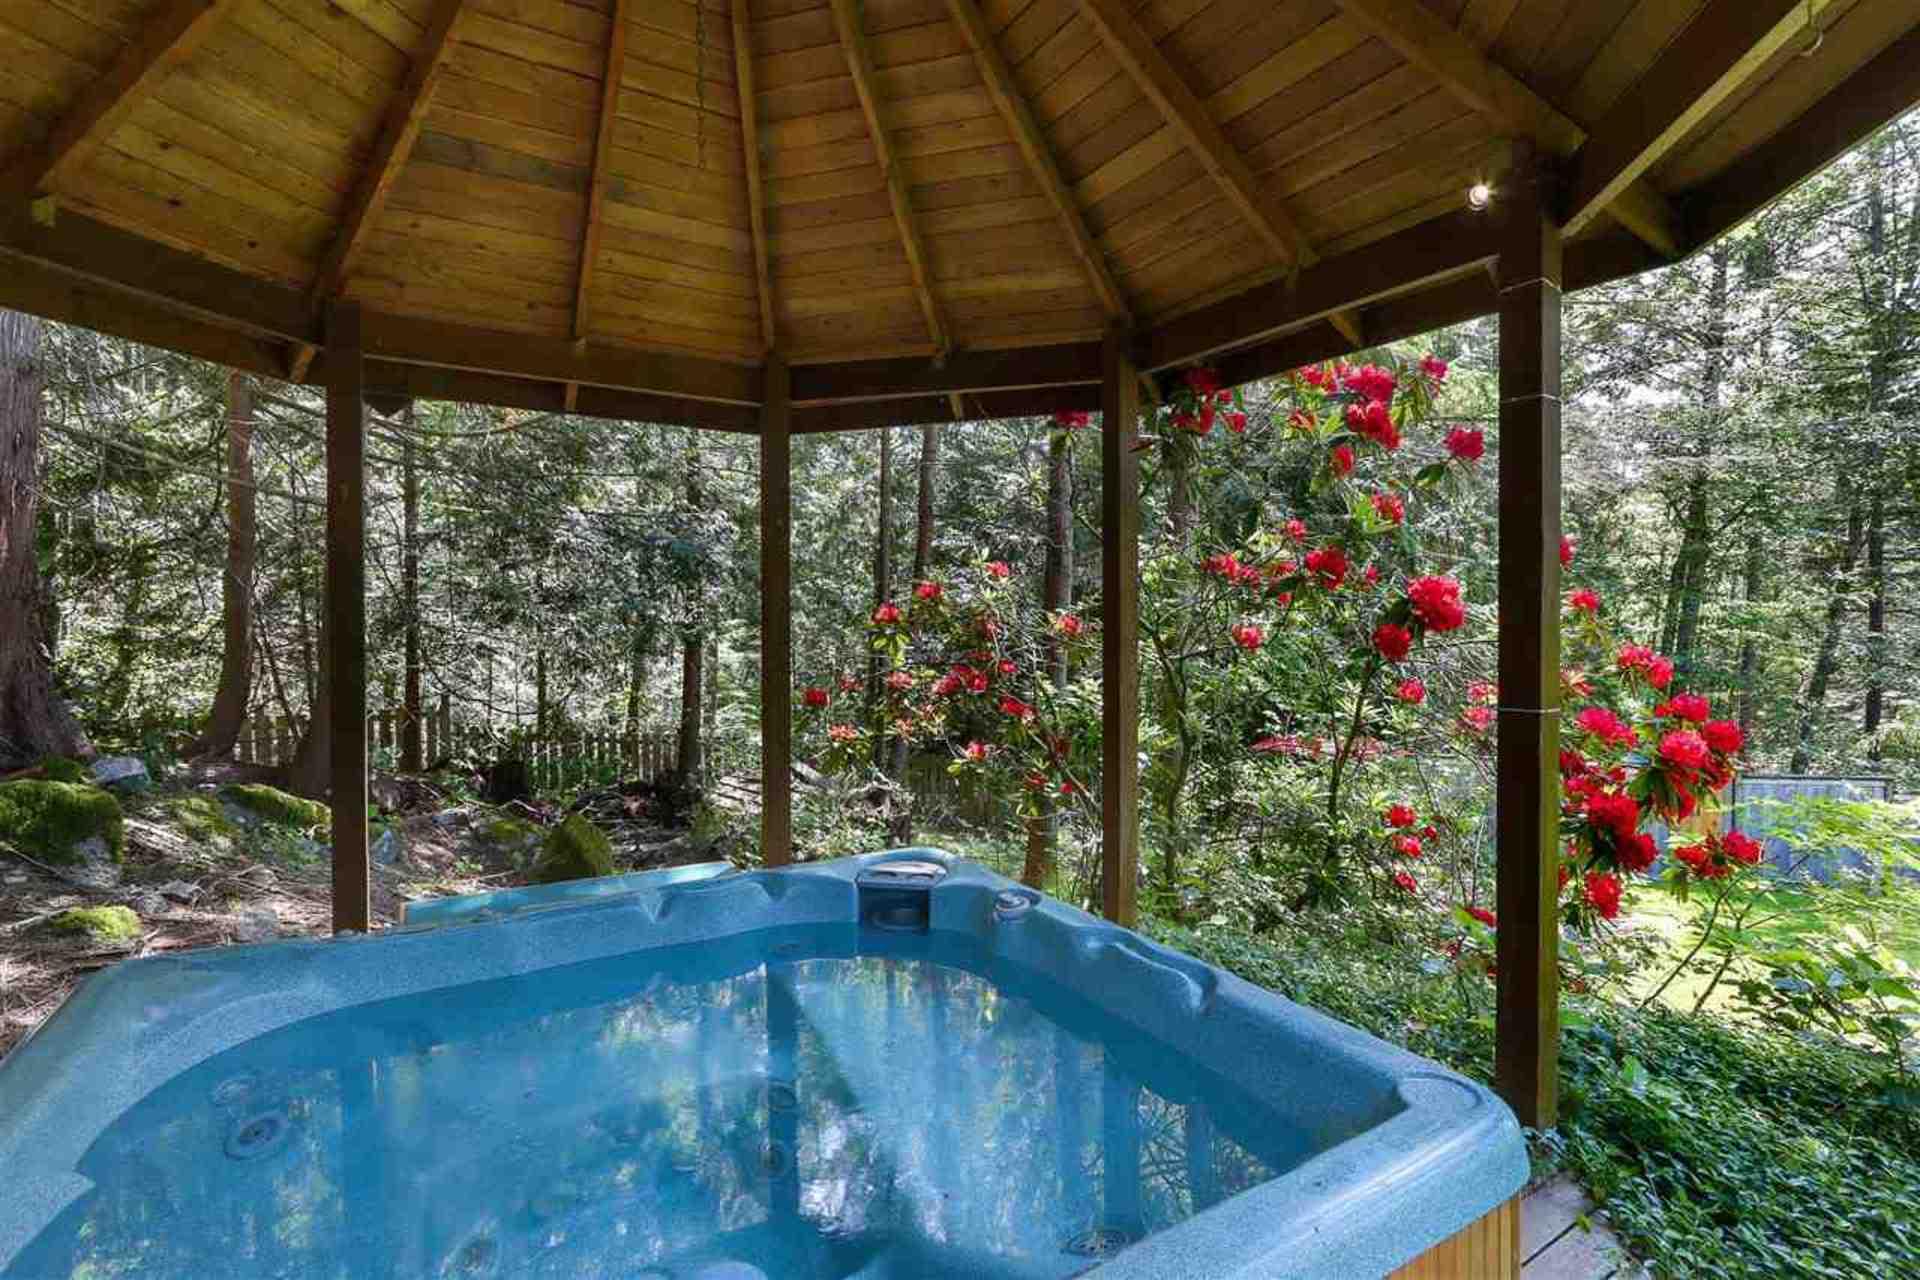 4734-woodgreen-drive-cypress-park-estates-west-vancouver-11 at 4734 Woodgreen Drive, Cypress Park Estates, West Vancouver